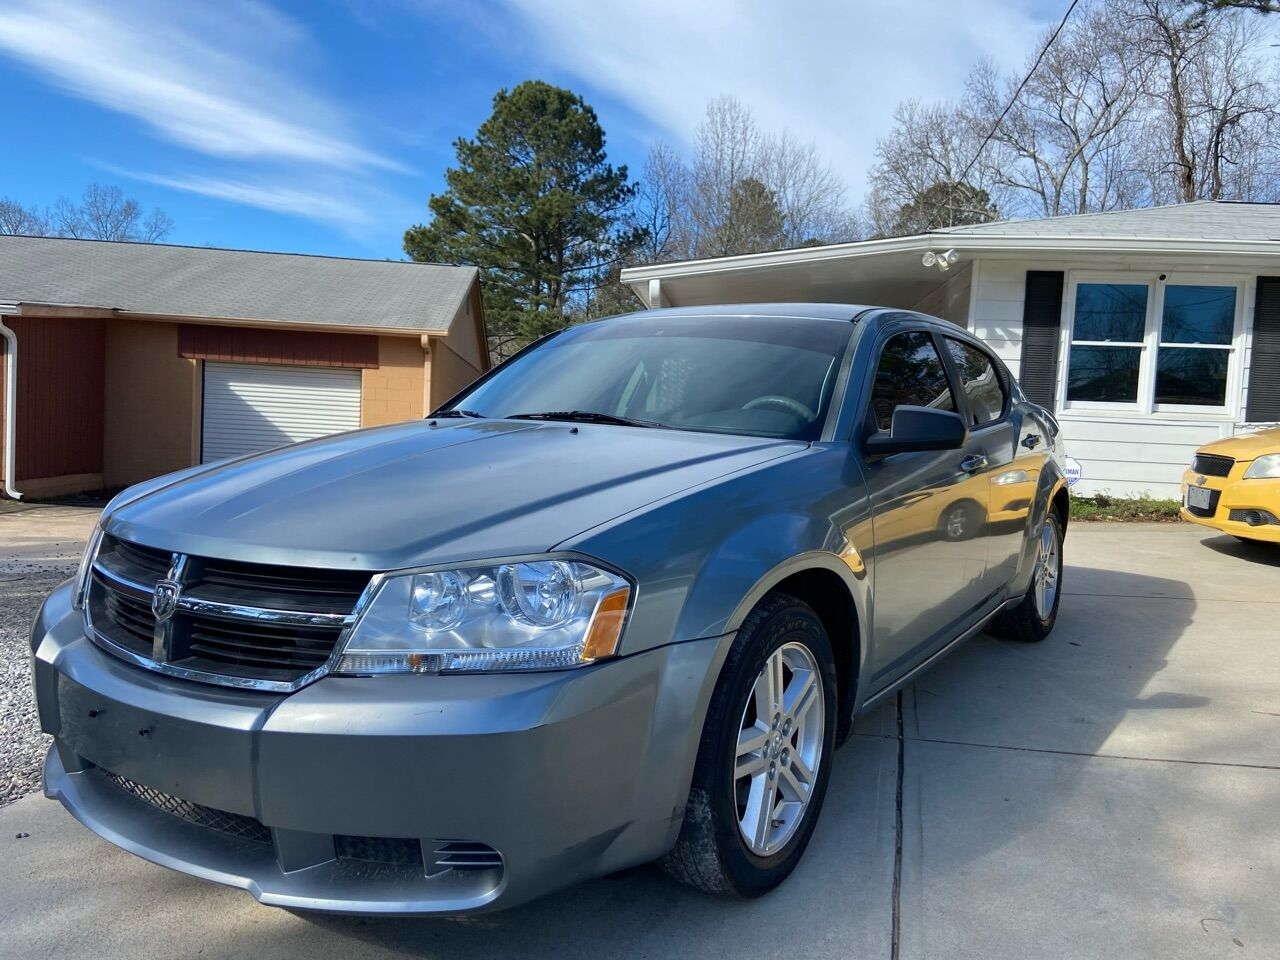 Used 2008 Dodge Avenger For Sale Carsforsale Com